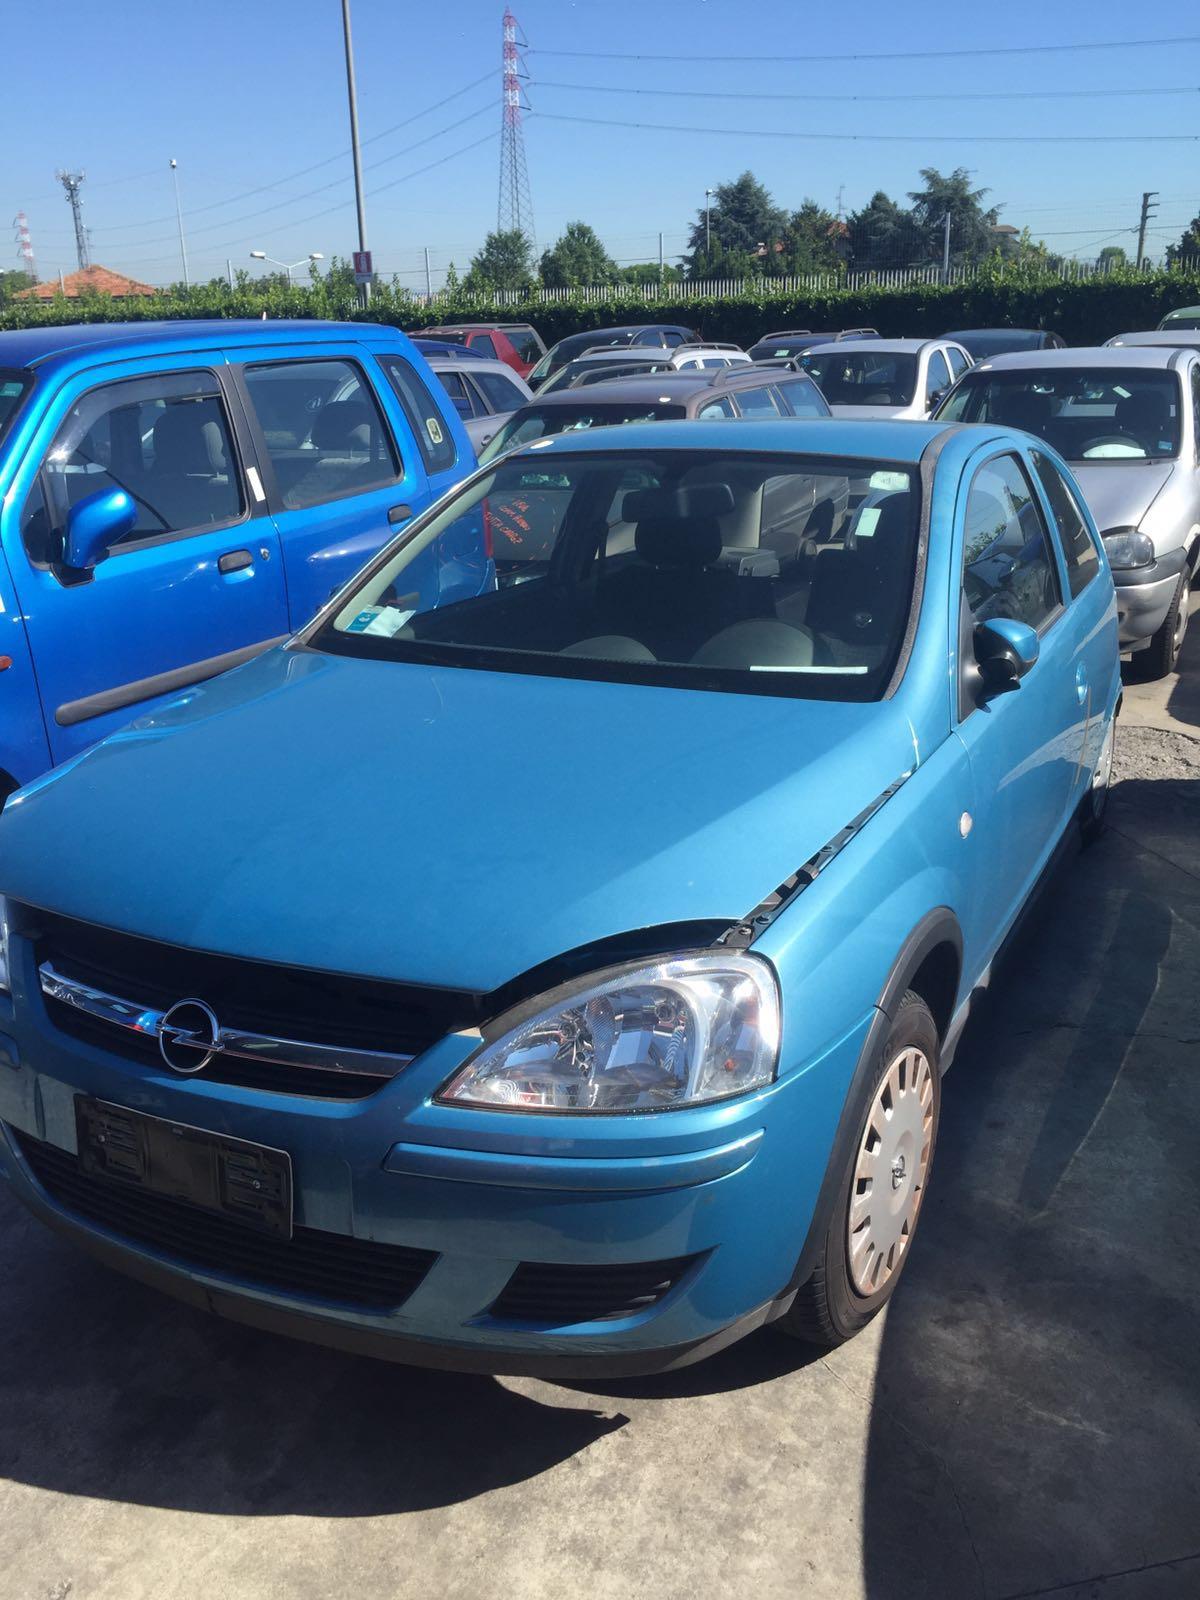 Dezmembrez Opel Corsa C FaceLift culoare albastru Z20N